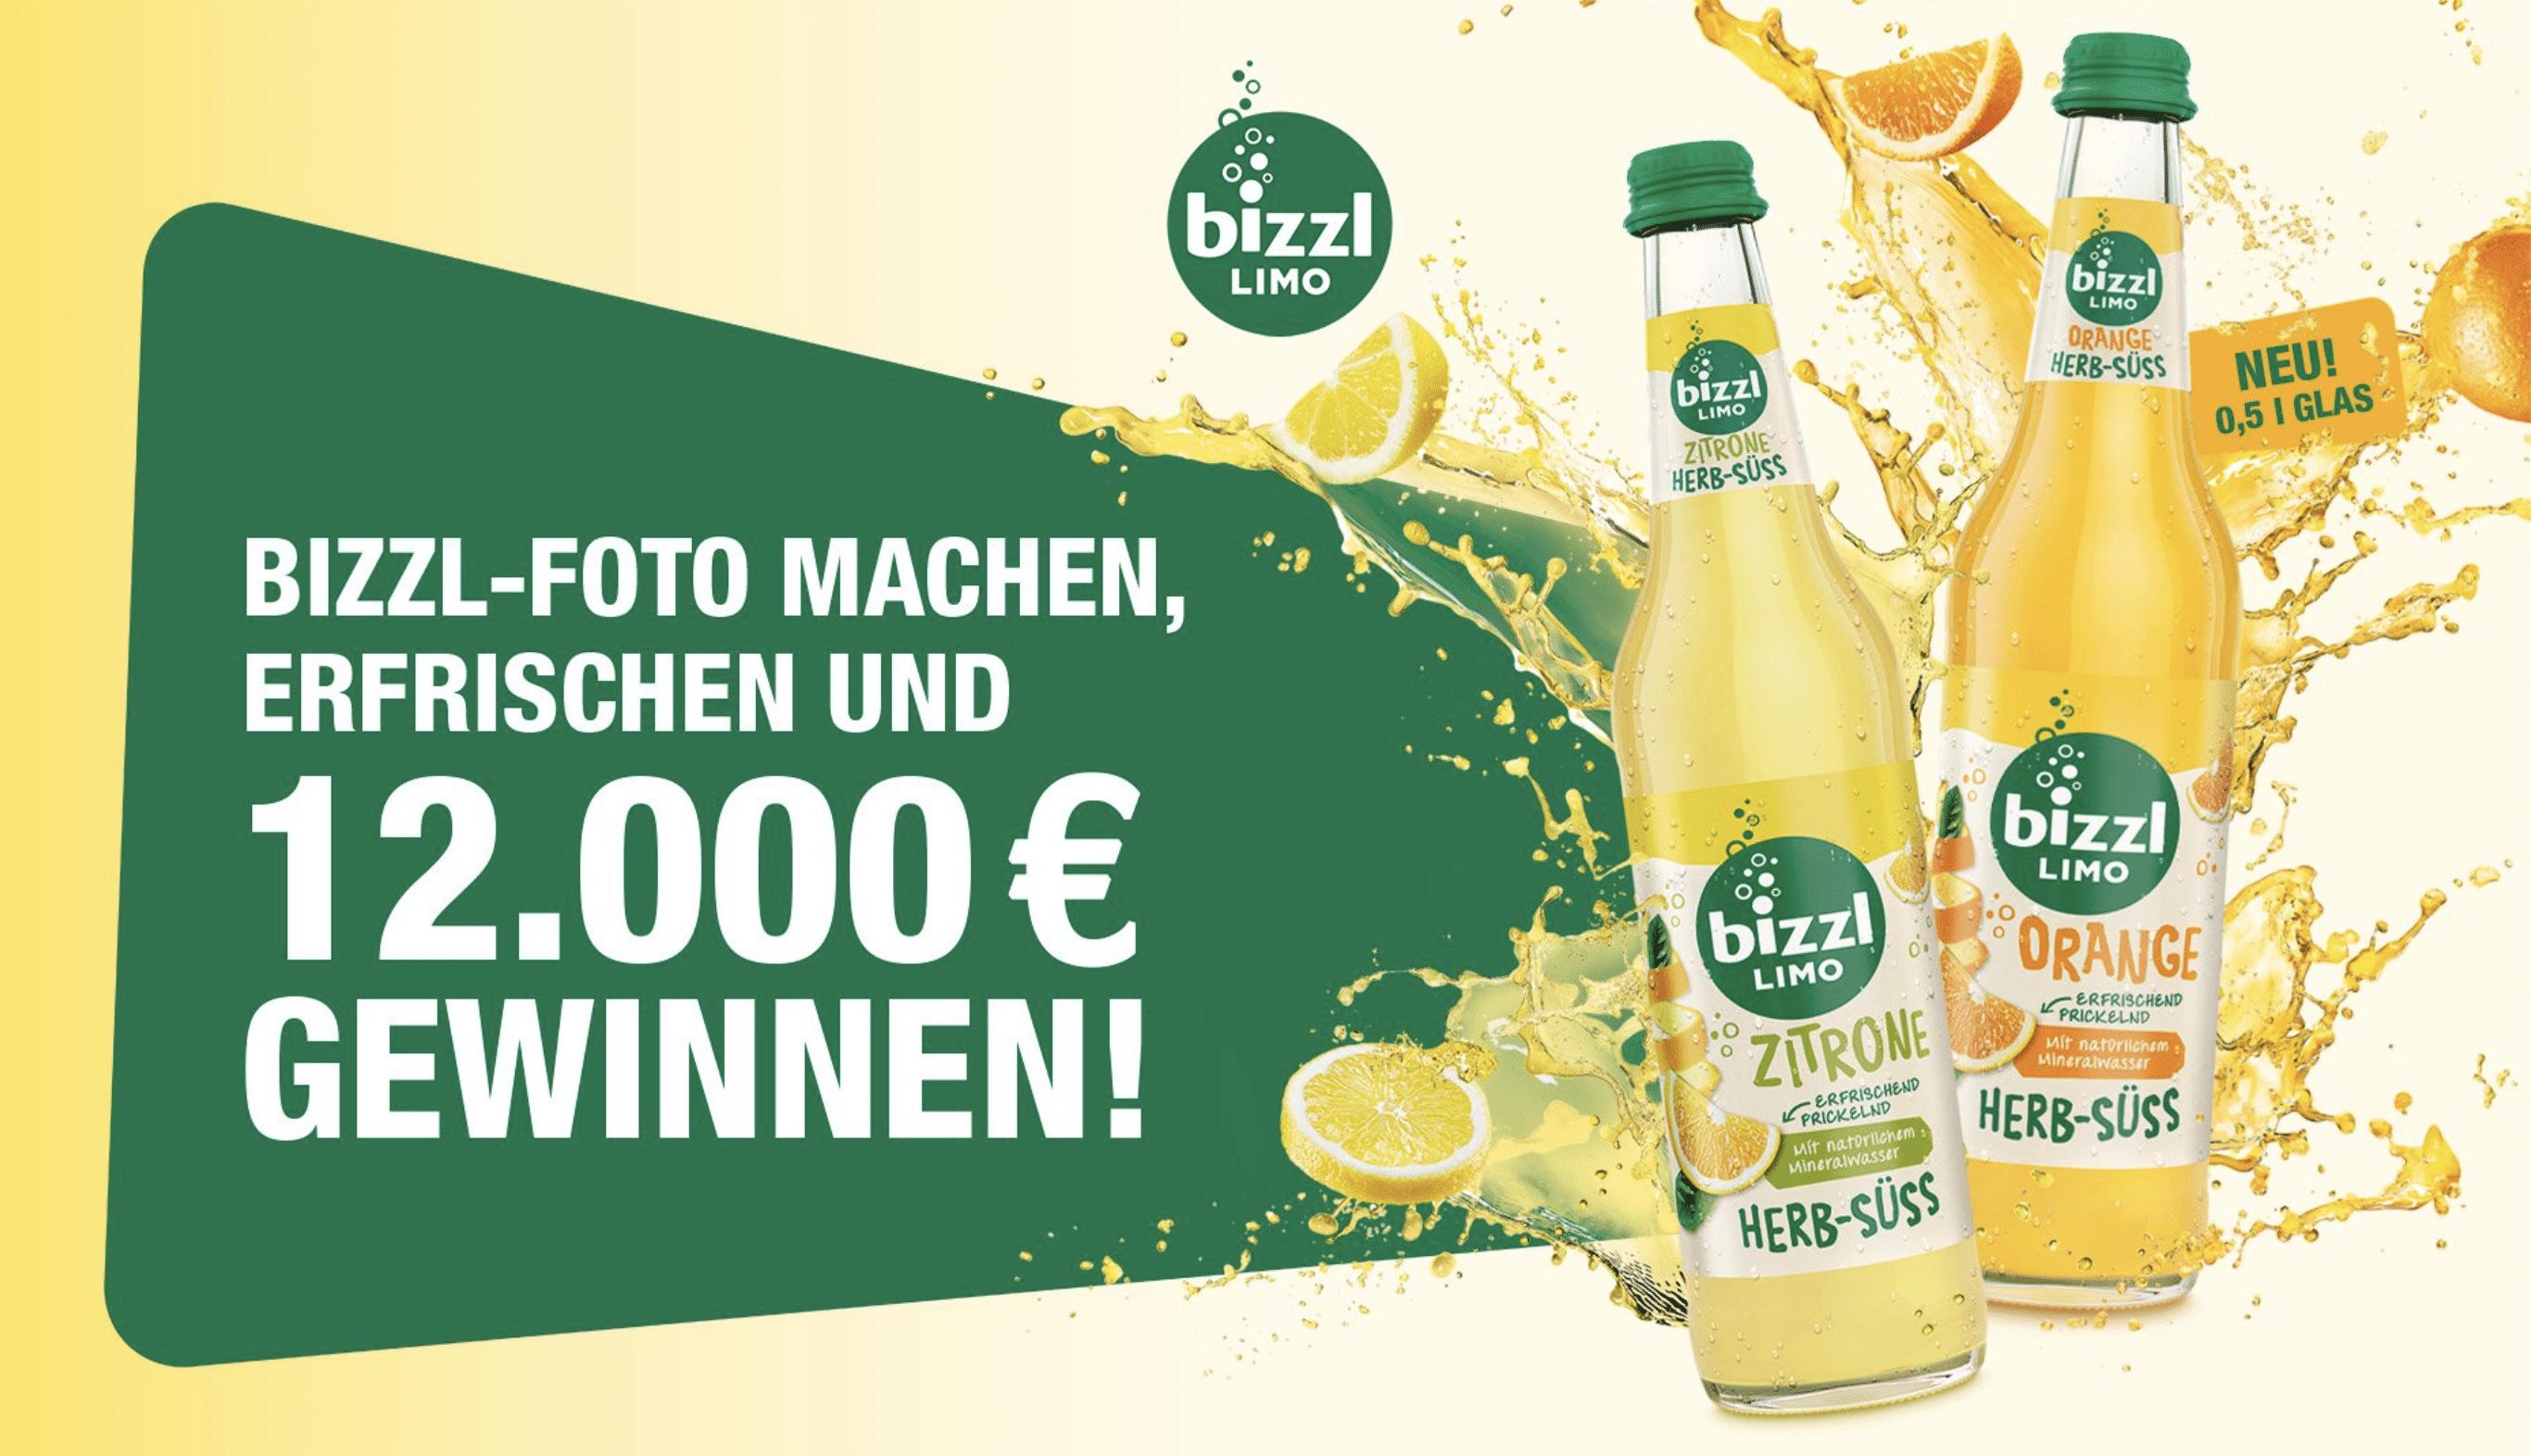 Gewinnspiel-Cases FMCG Getränke Bizzl